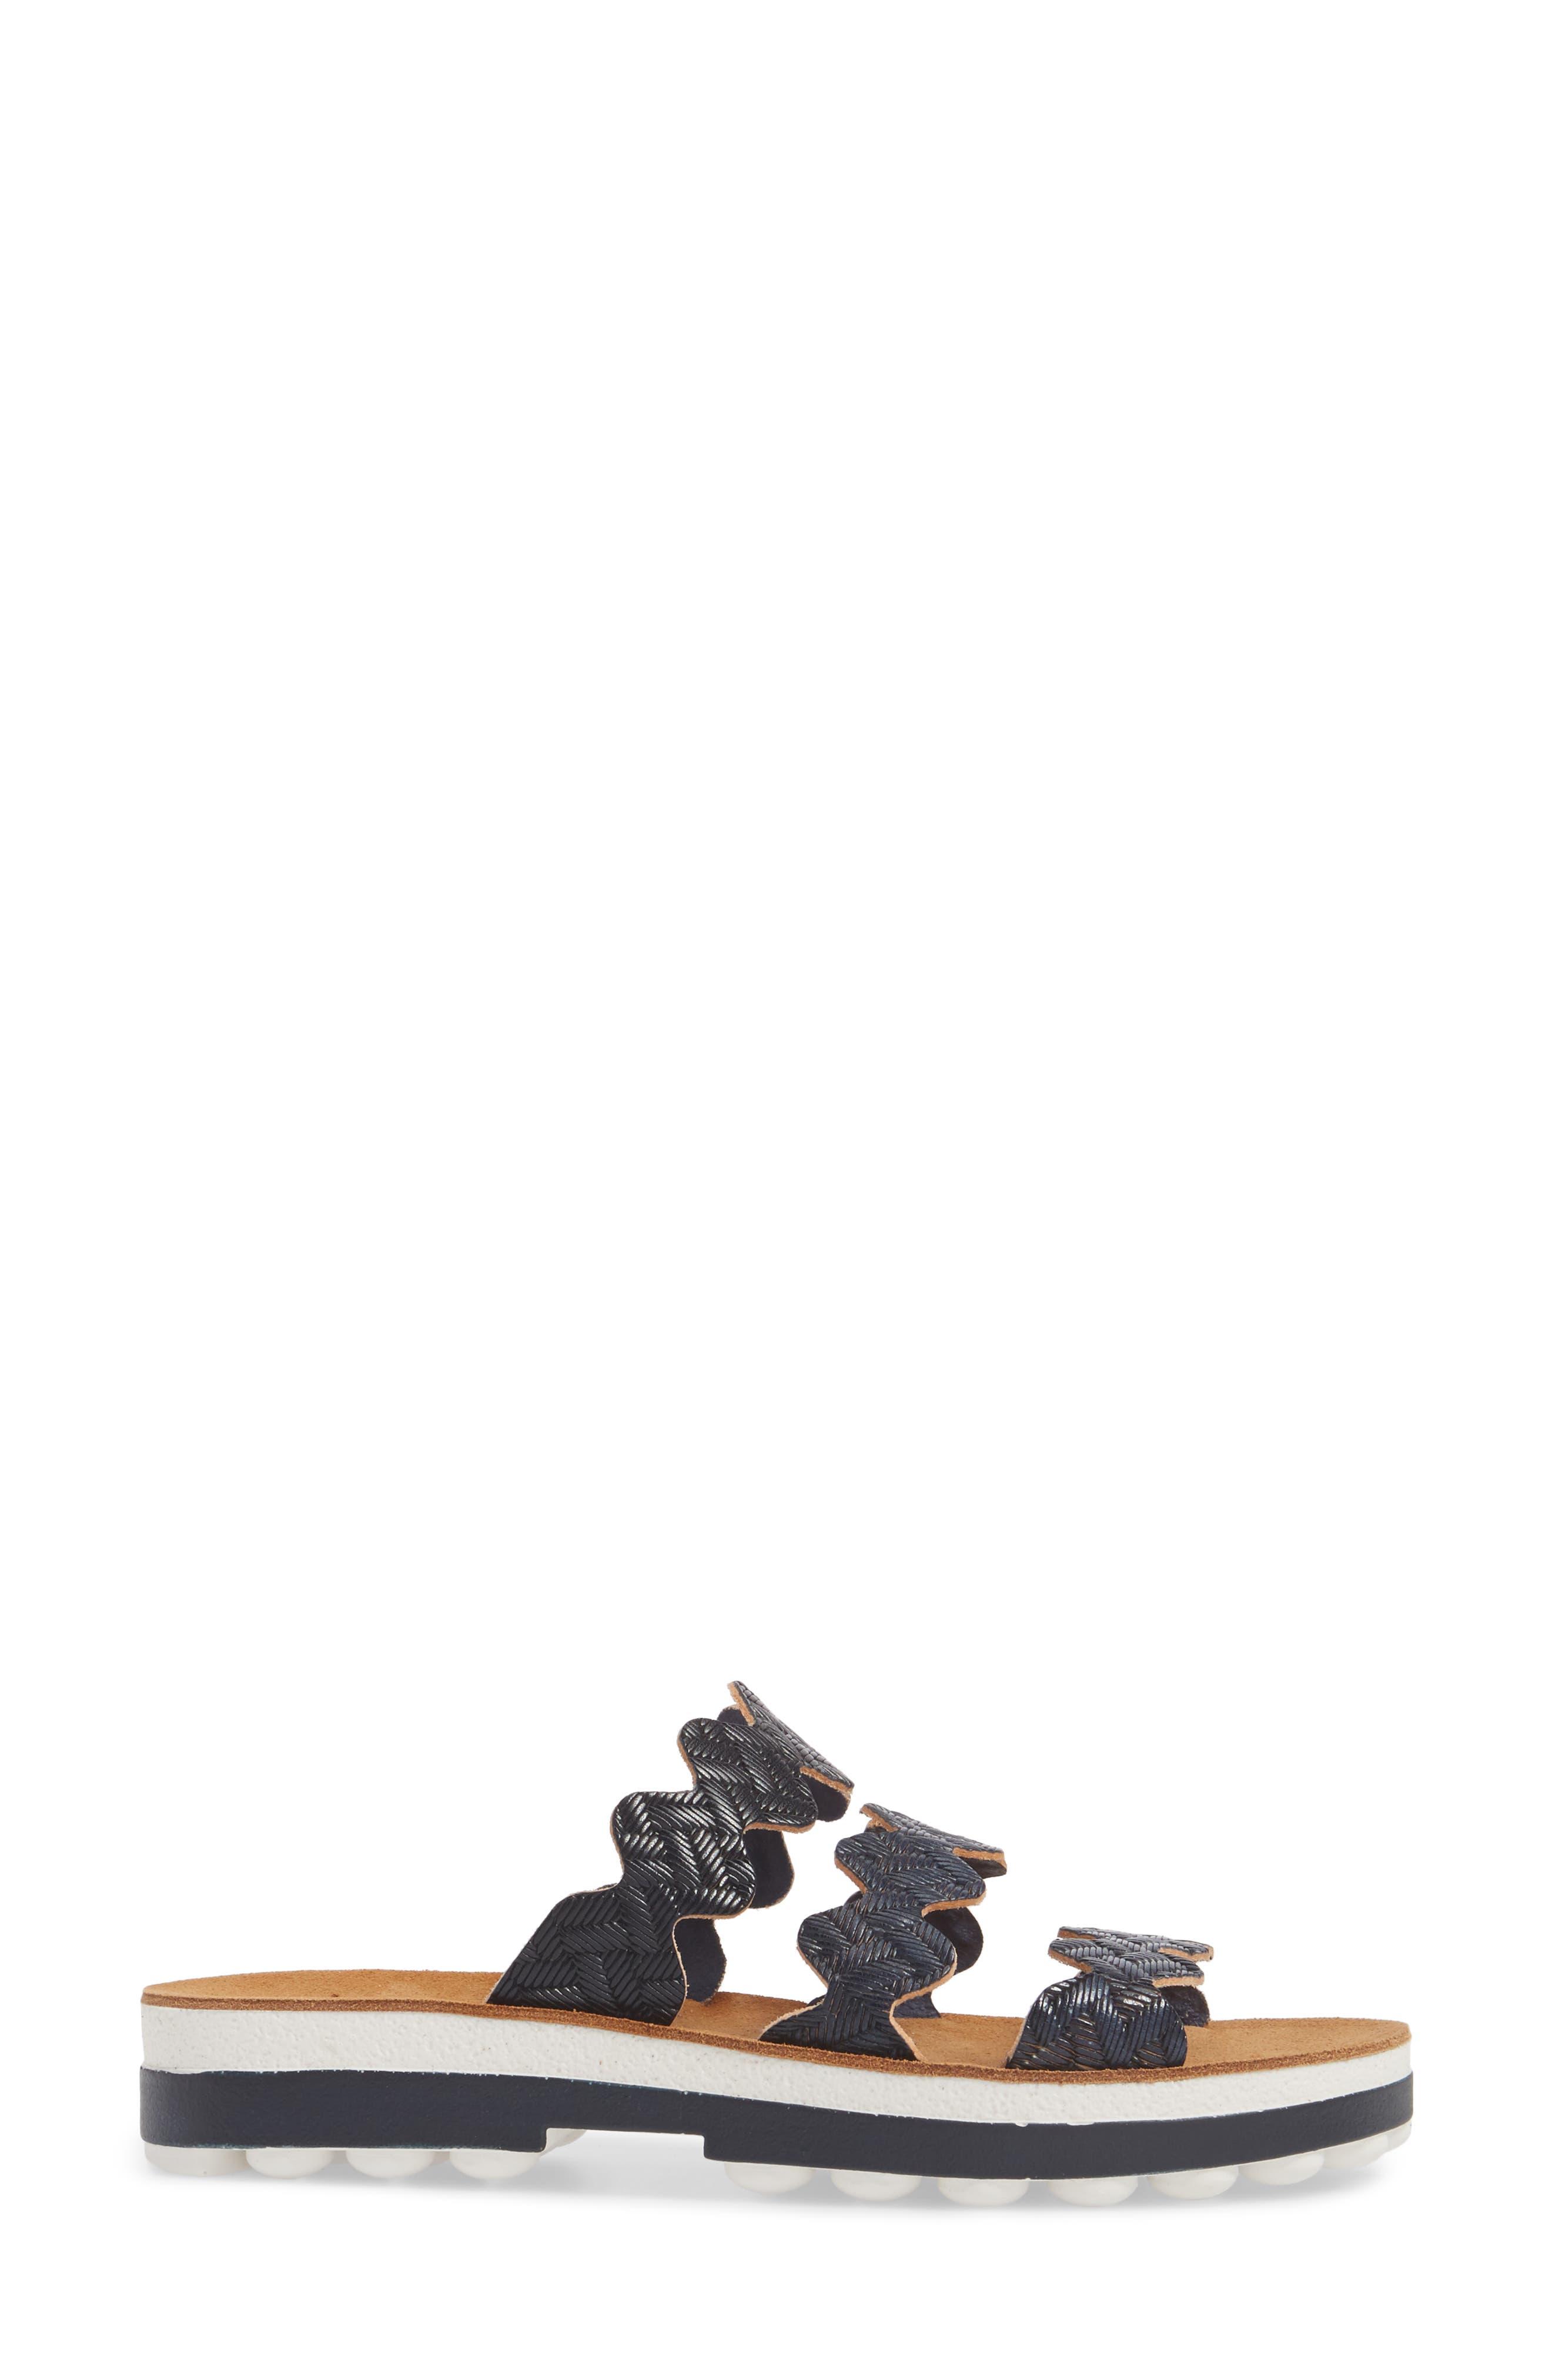 Alternate Image 3  - Fantasy Sandals Waves Slide Sandal (Women)